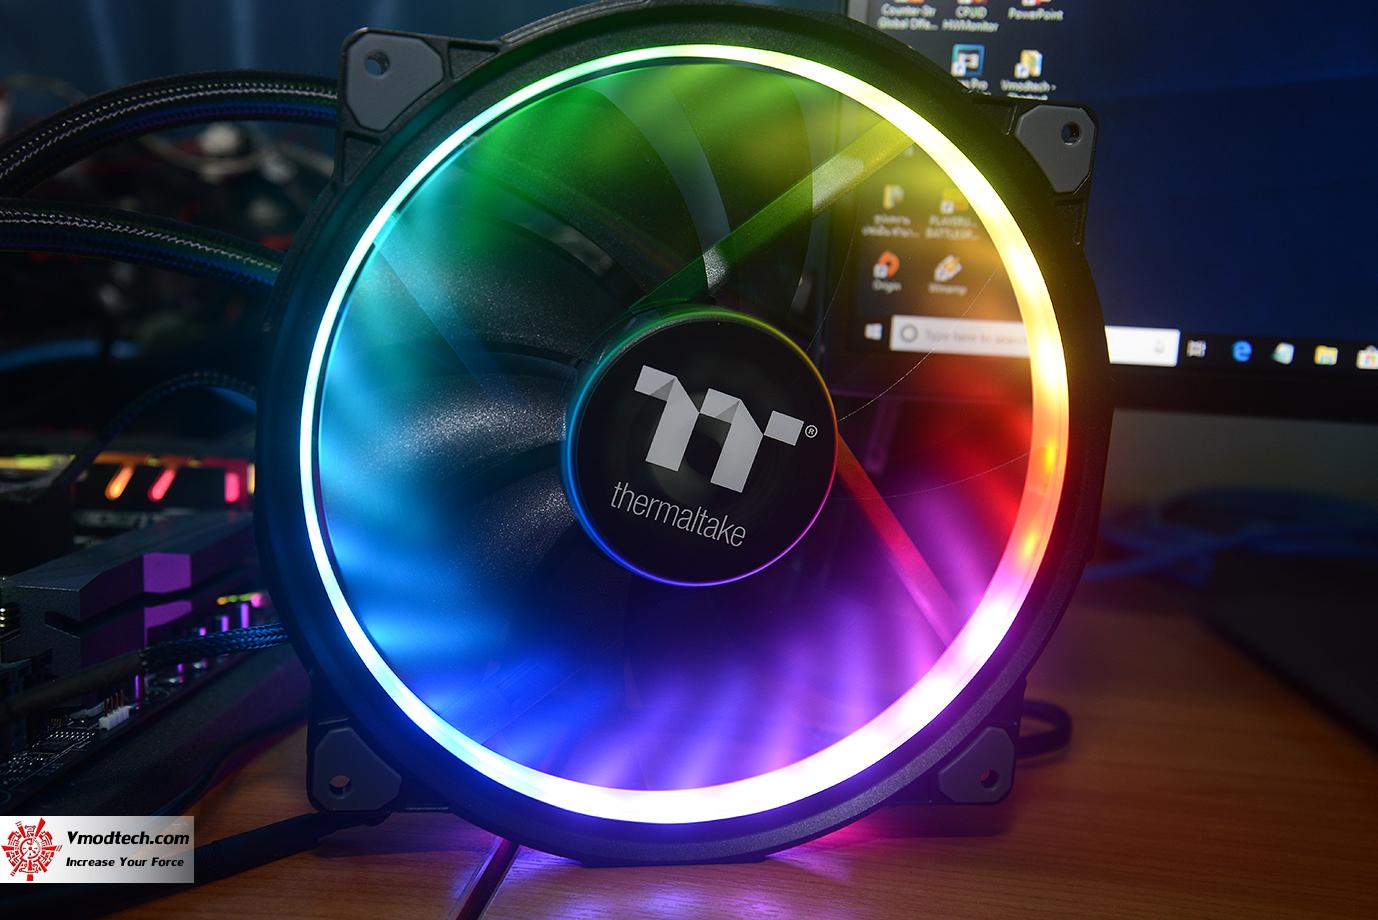 dsc 6629 Thermaltake Riing Plus 20 RGB Case Fan TT Premium Edition (Single Fan Pack w/o Controller) Review